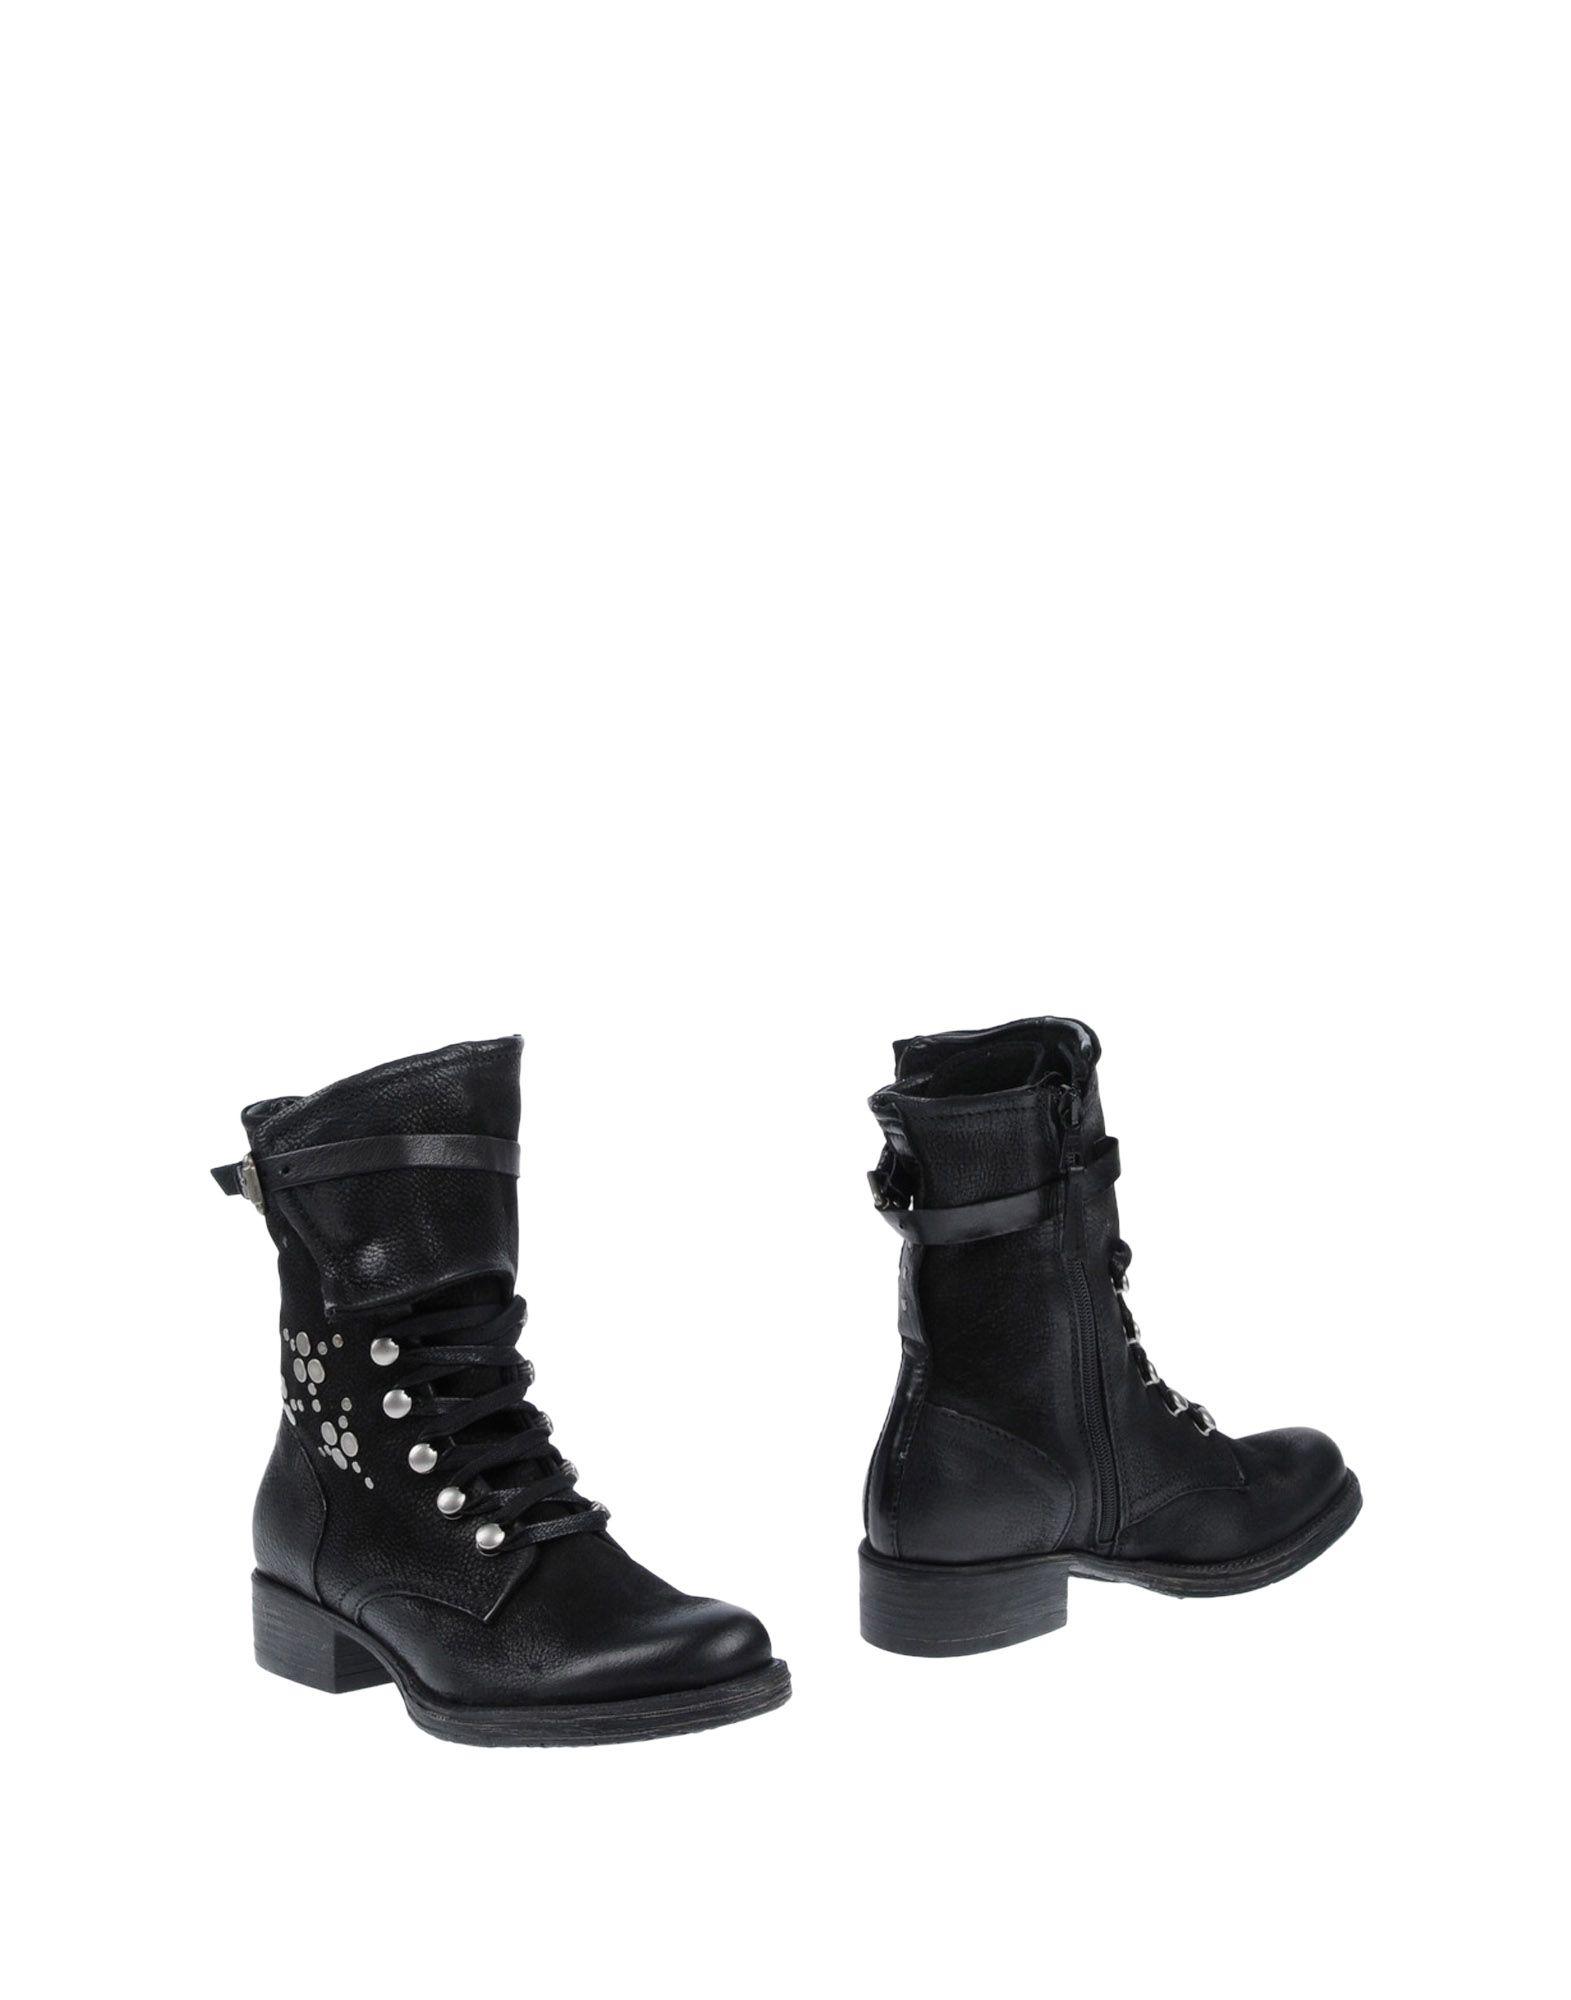 Ovye' By Cristina 11456691TN Lucchi Stiefelette Damen  11456691TN Cristina Gute Qualität beliebte Schuhe 850e40